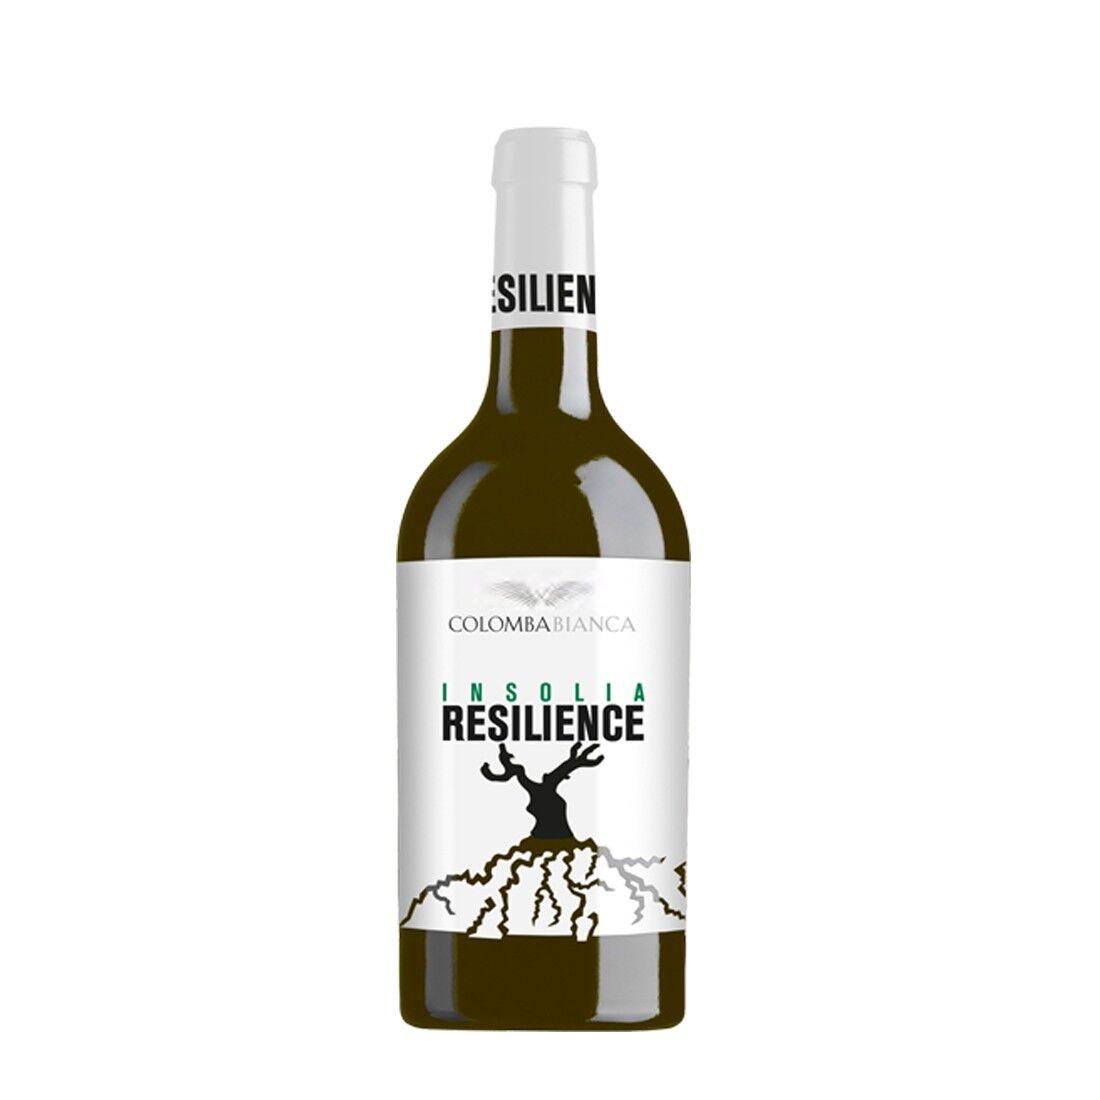 Colomba Bianca Insolia Sicilia DOC Resilience 2020 -